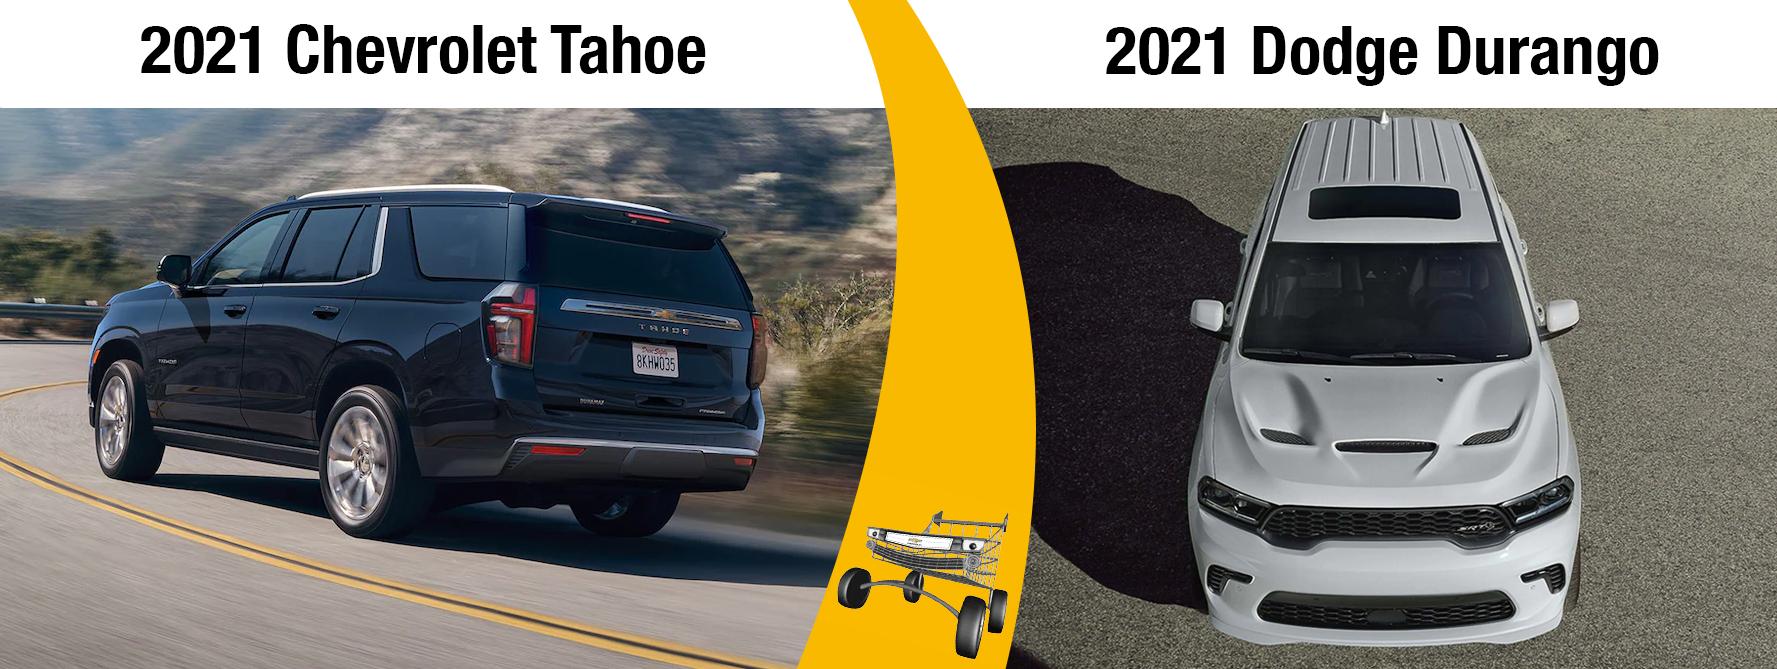 New 2021 Chevrolet Tahoe Vs. the 2021 Dodge Durango Differences